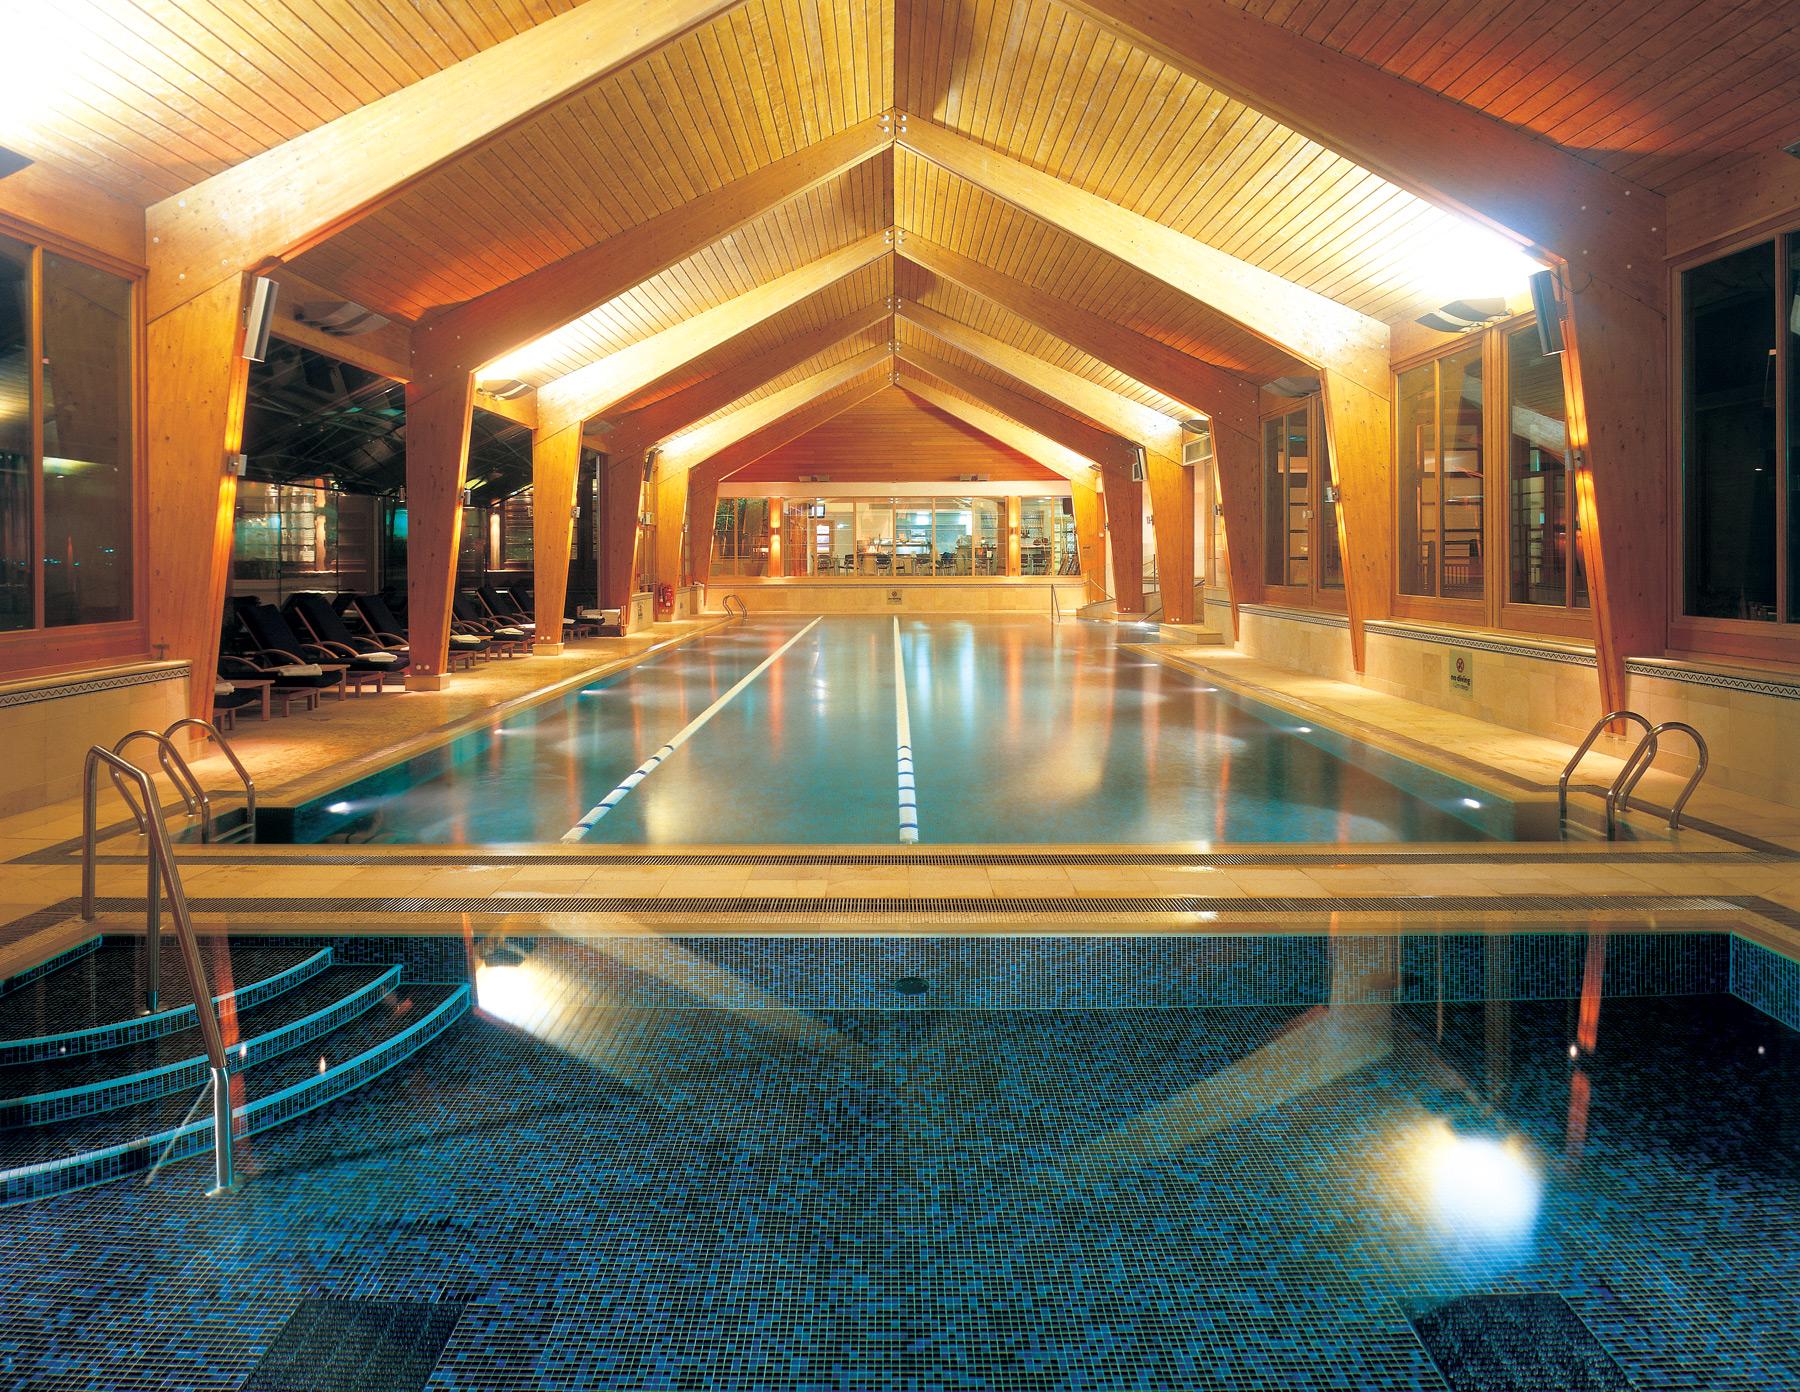 Indoor-pool-at-Wentworth-golf-club